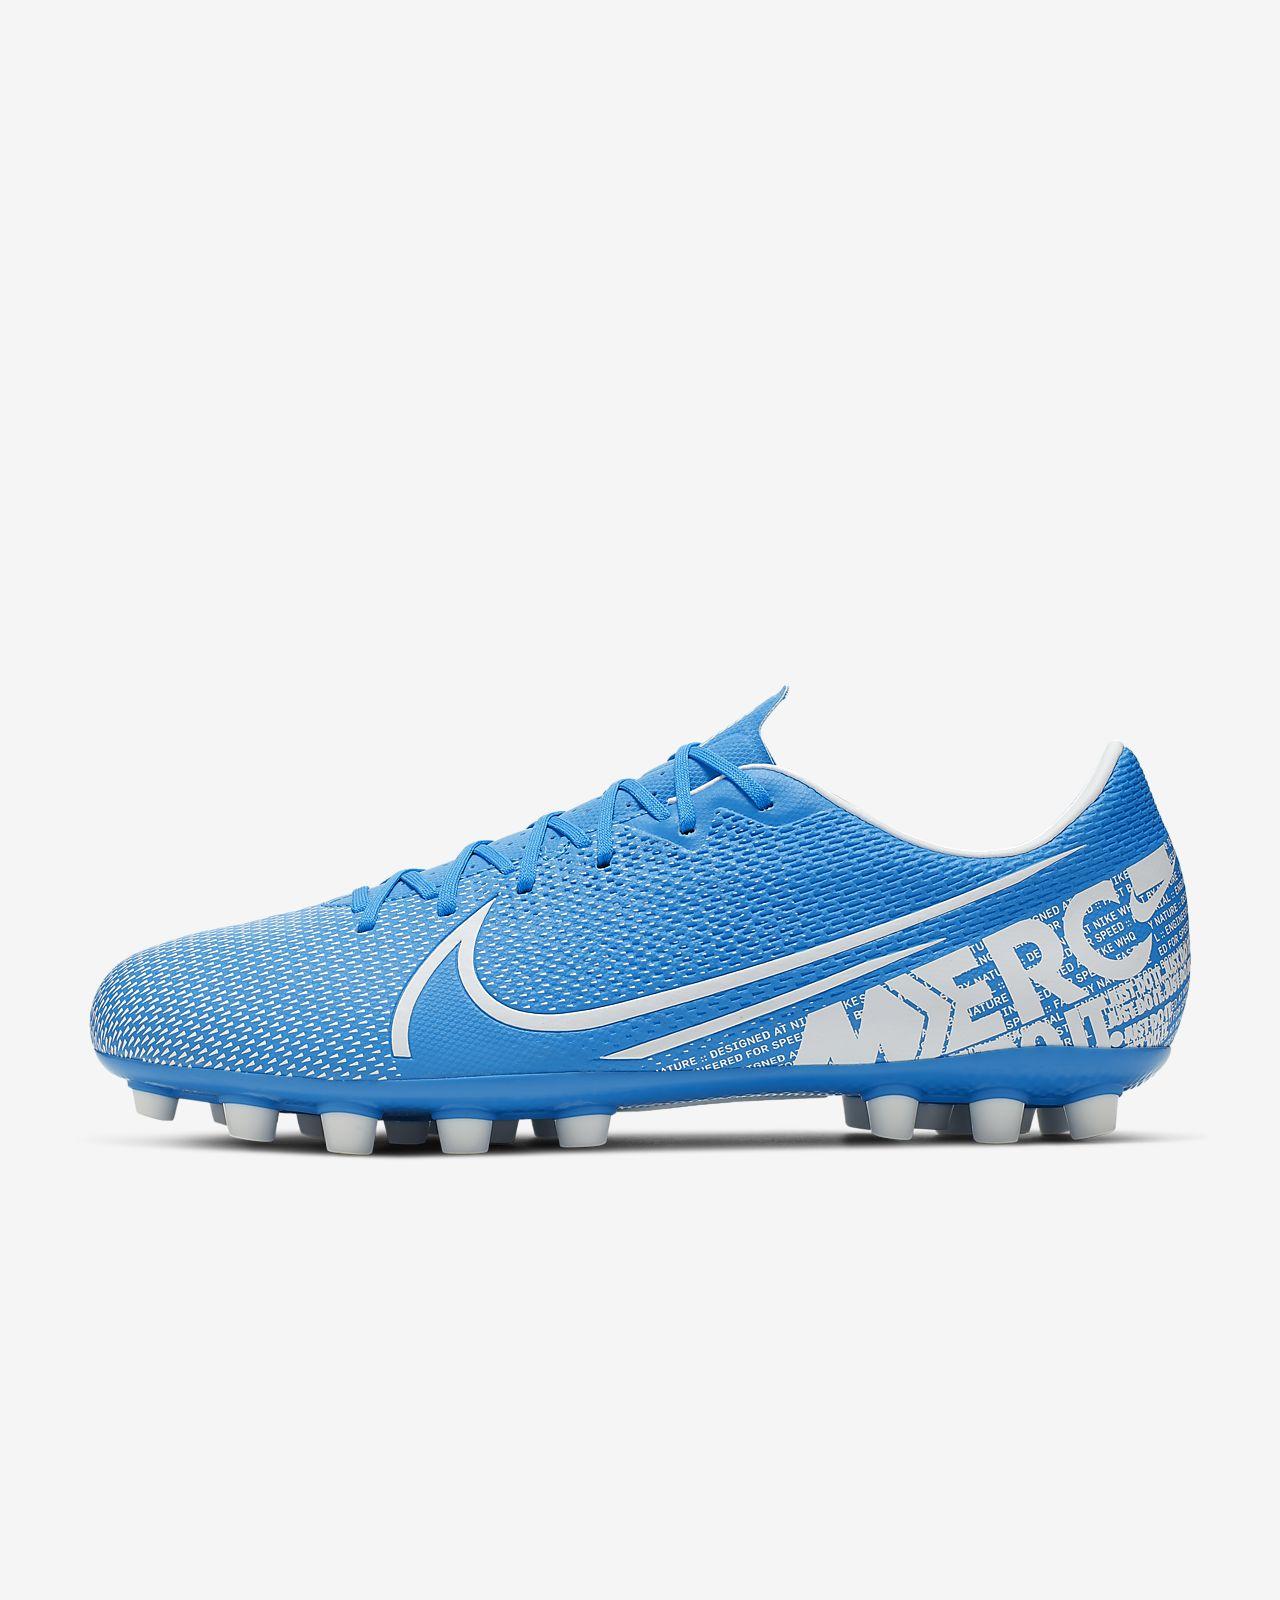 Nike Mercurial Vapor 13 Academy AG Fußballschuh für Kunstrasen